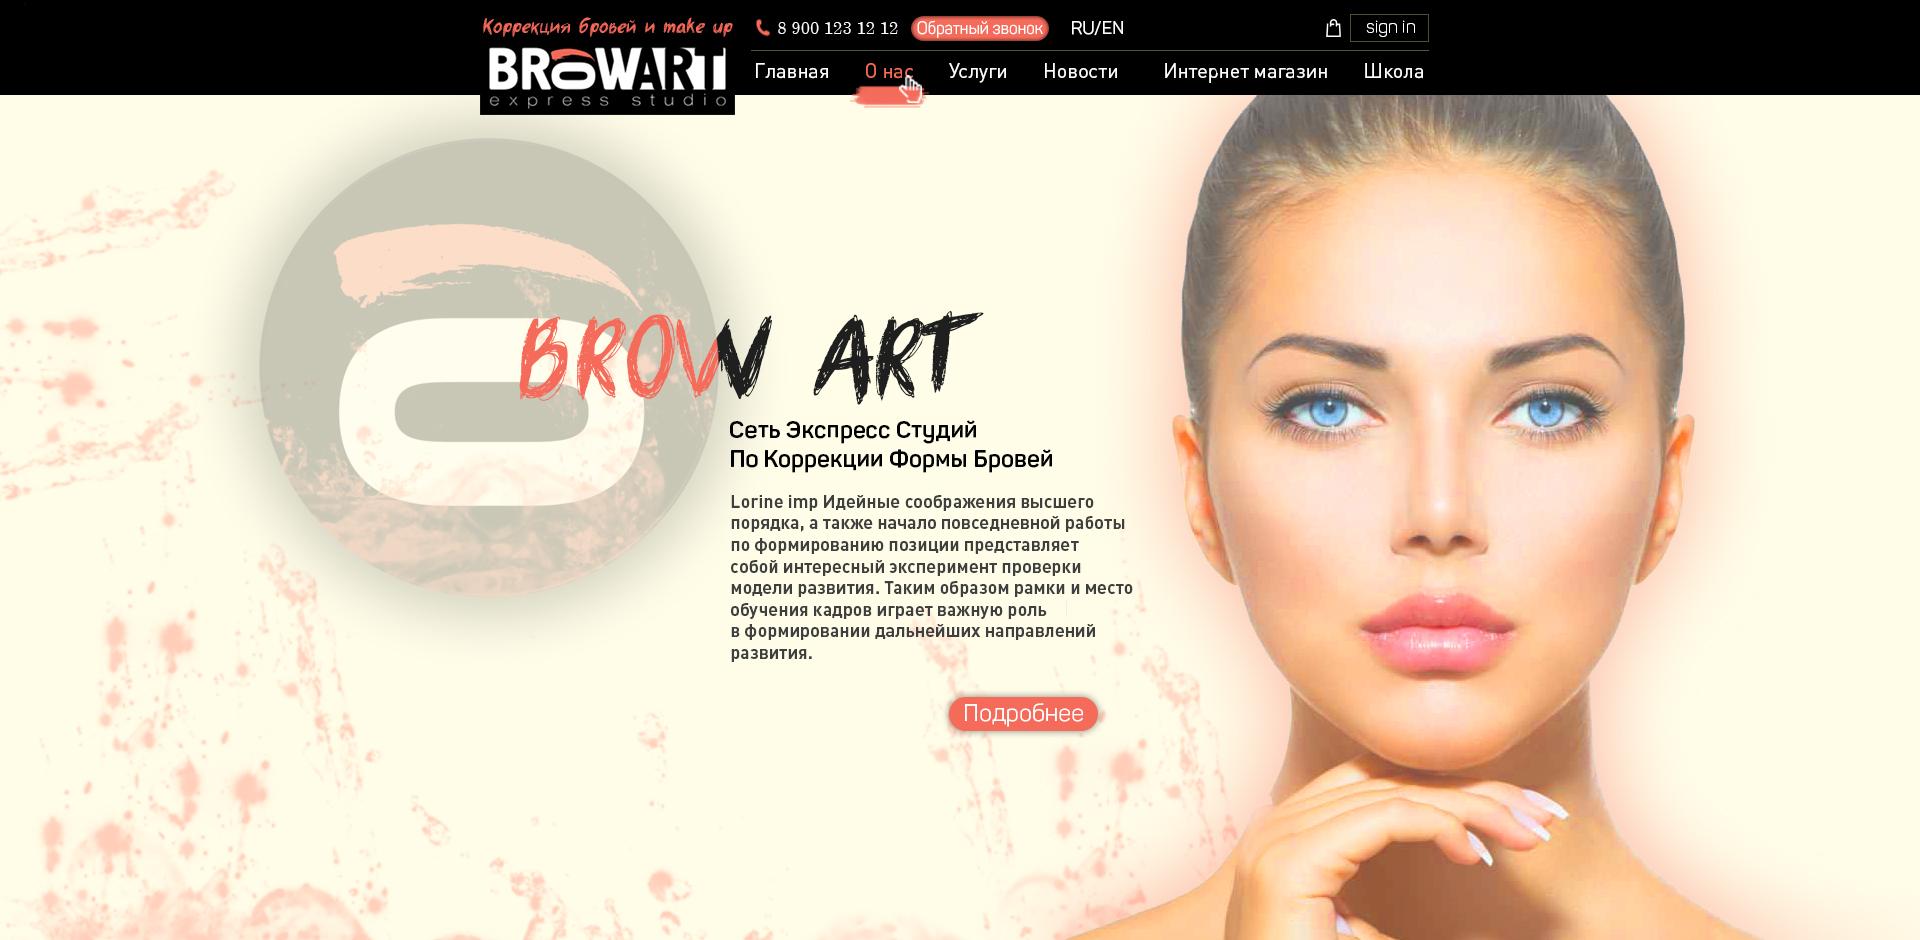 Дизайн сайта на основе готового прототипа-схемы и концепции фото f_8865a26ed72eb15c.jpg